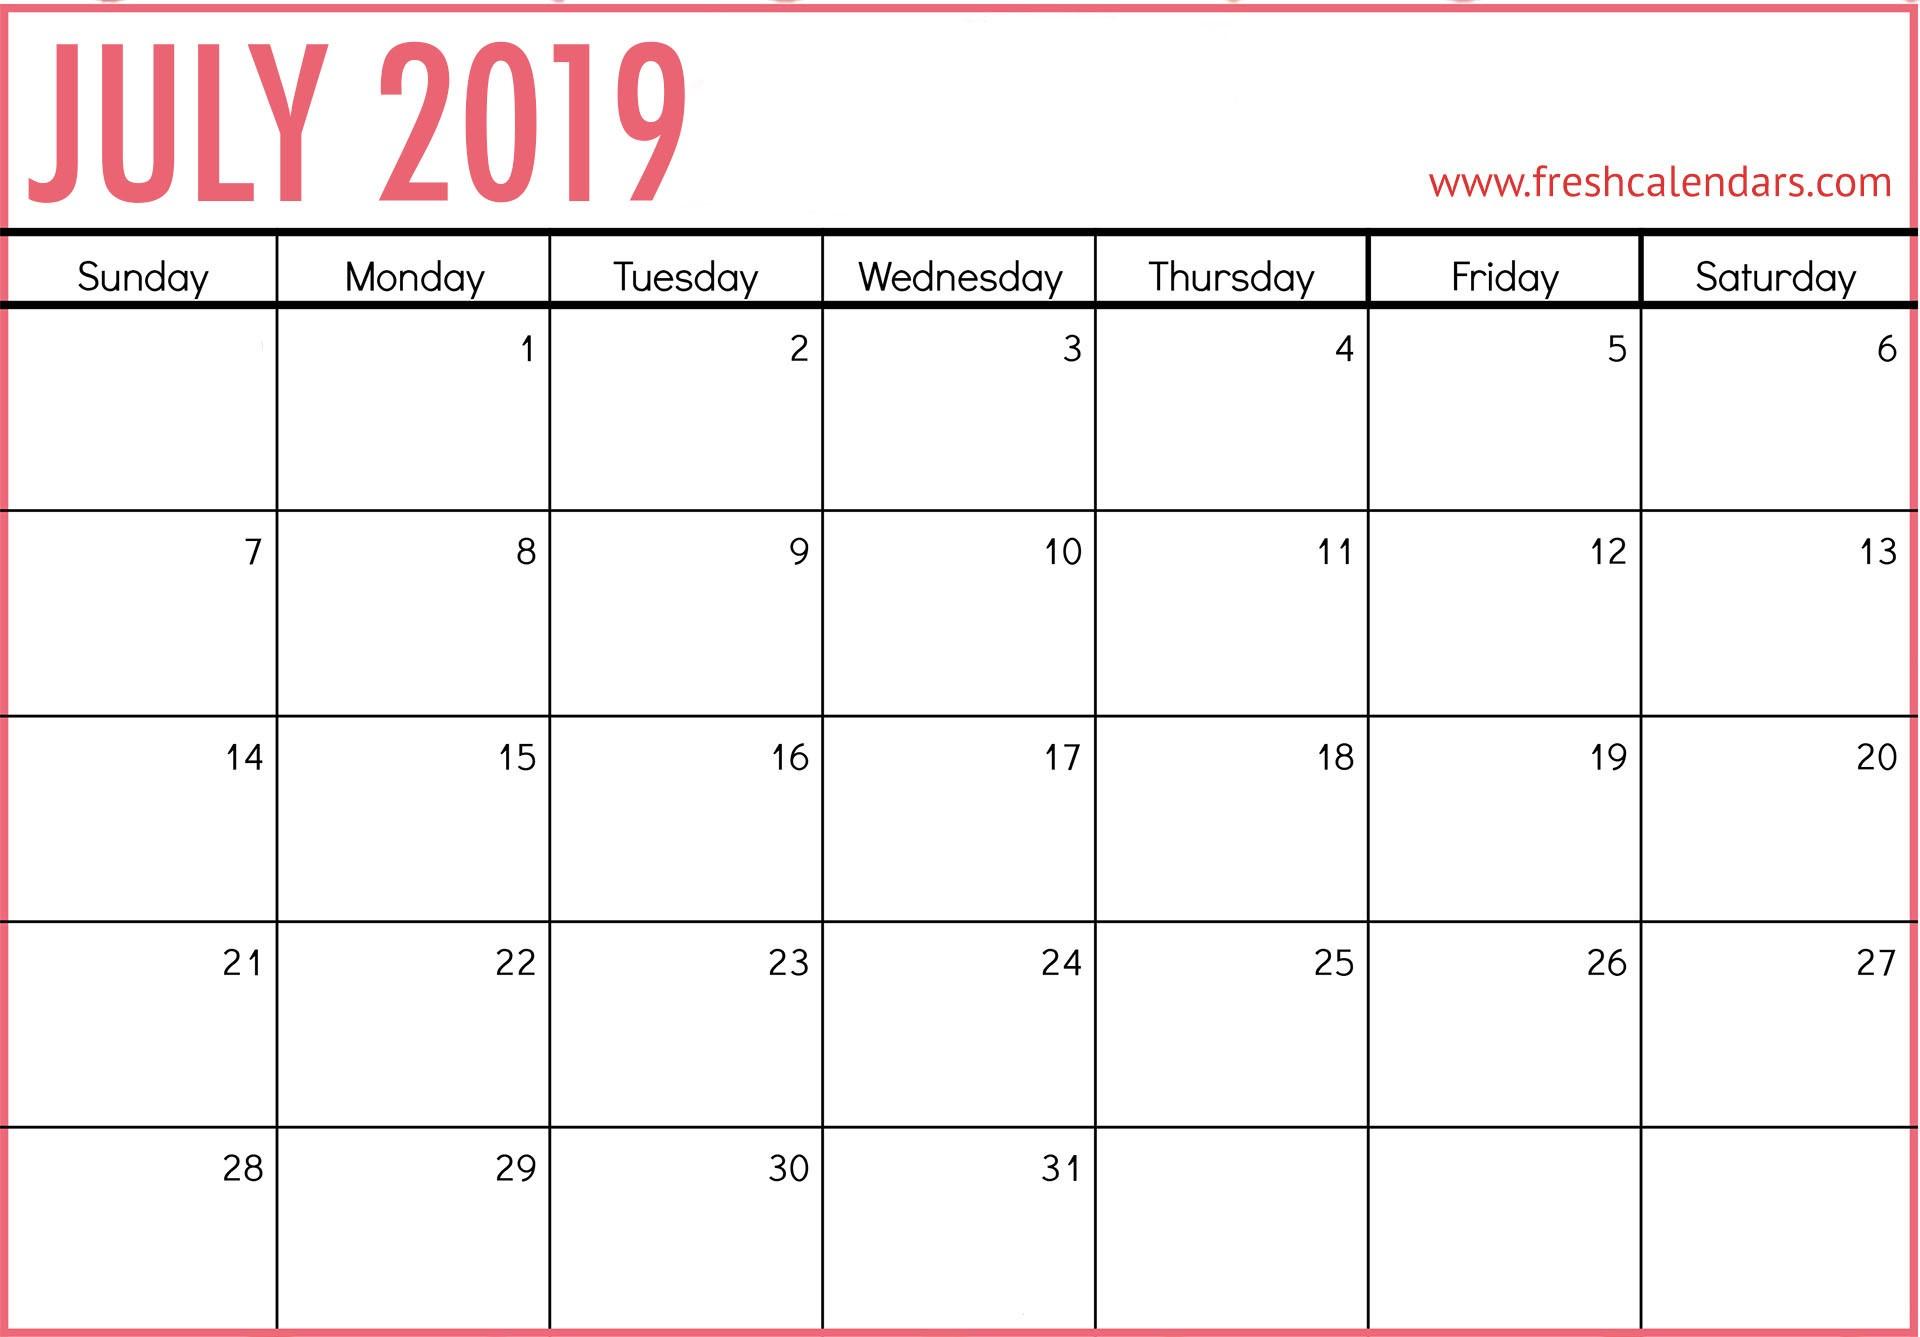 July 2019 Calendar Printable Fresh Calendars